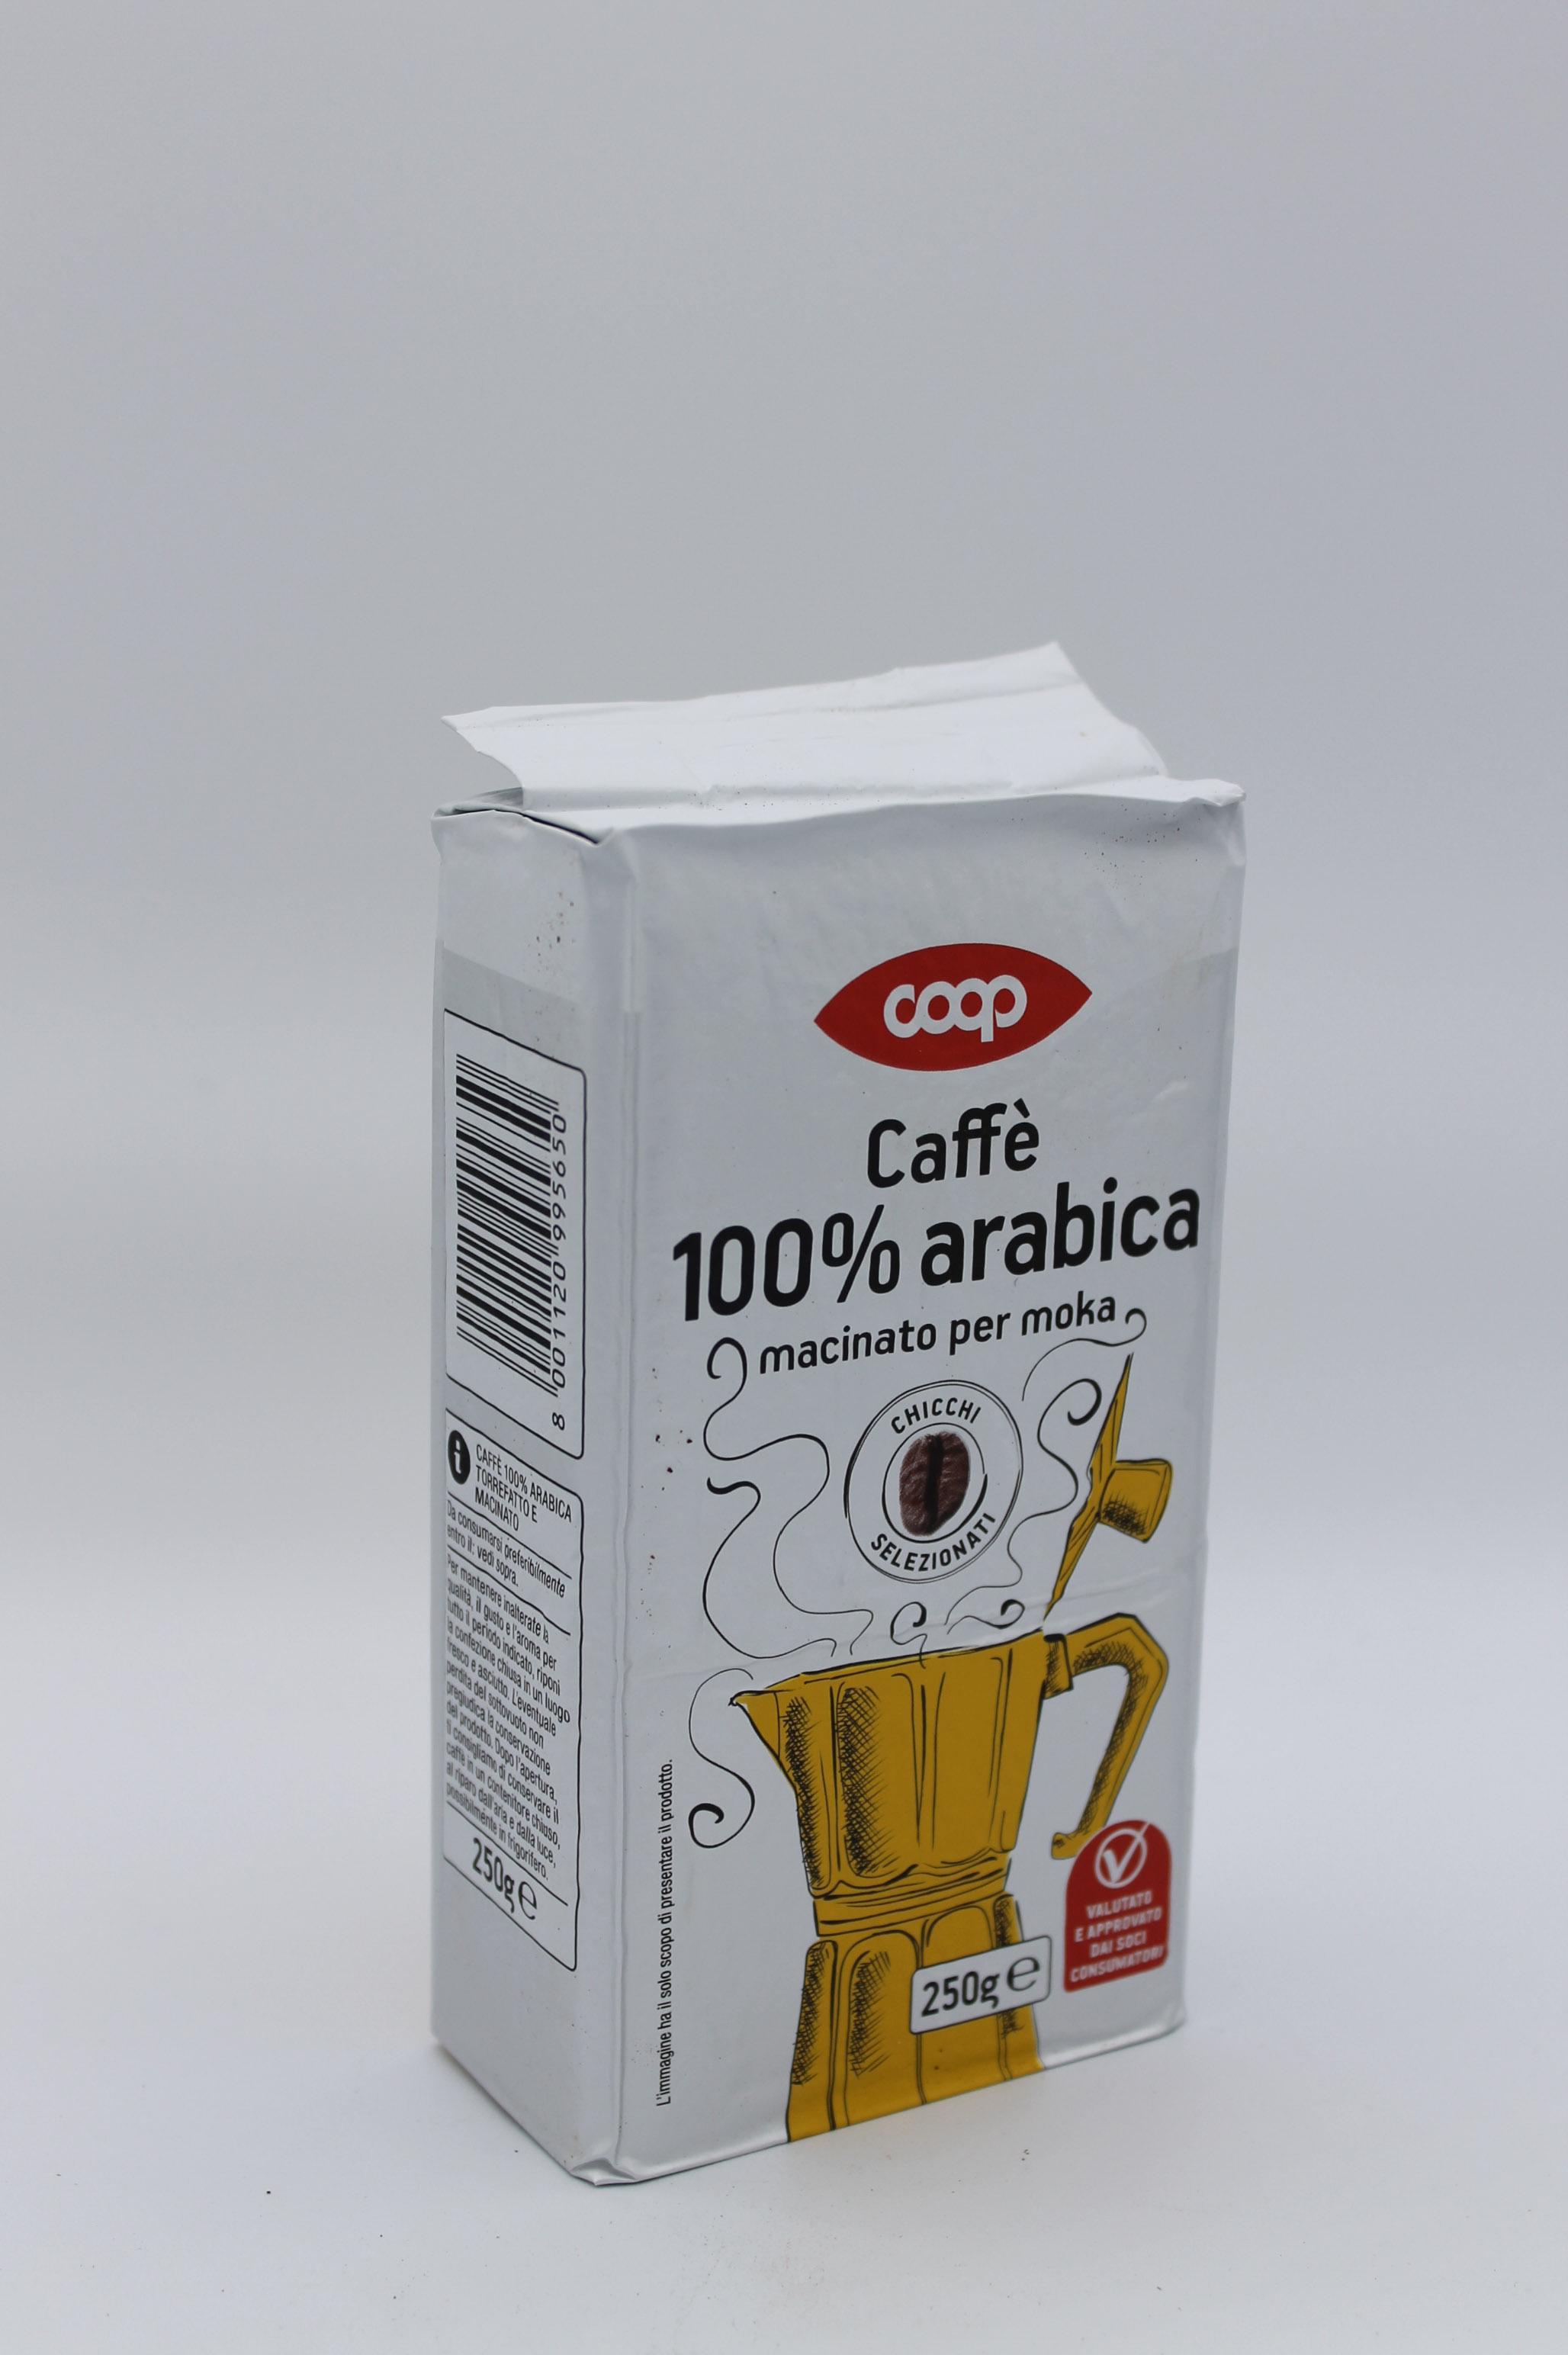 coop caffè 100% arabica 250 gr.